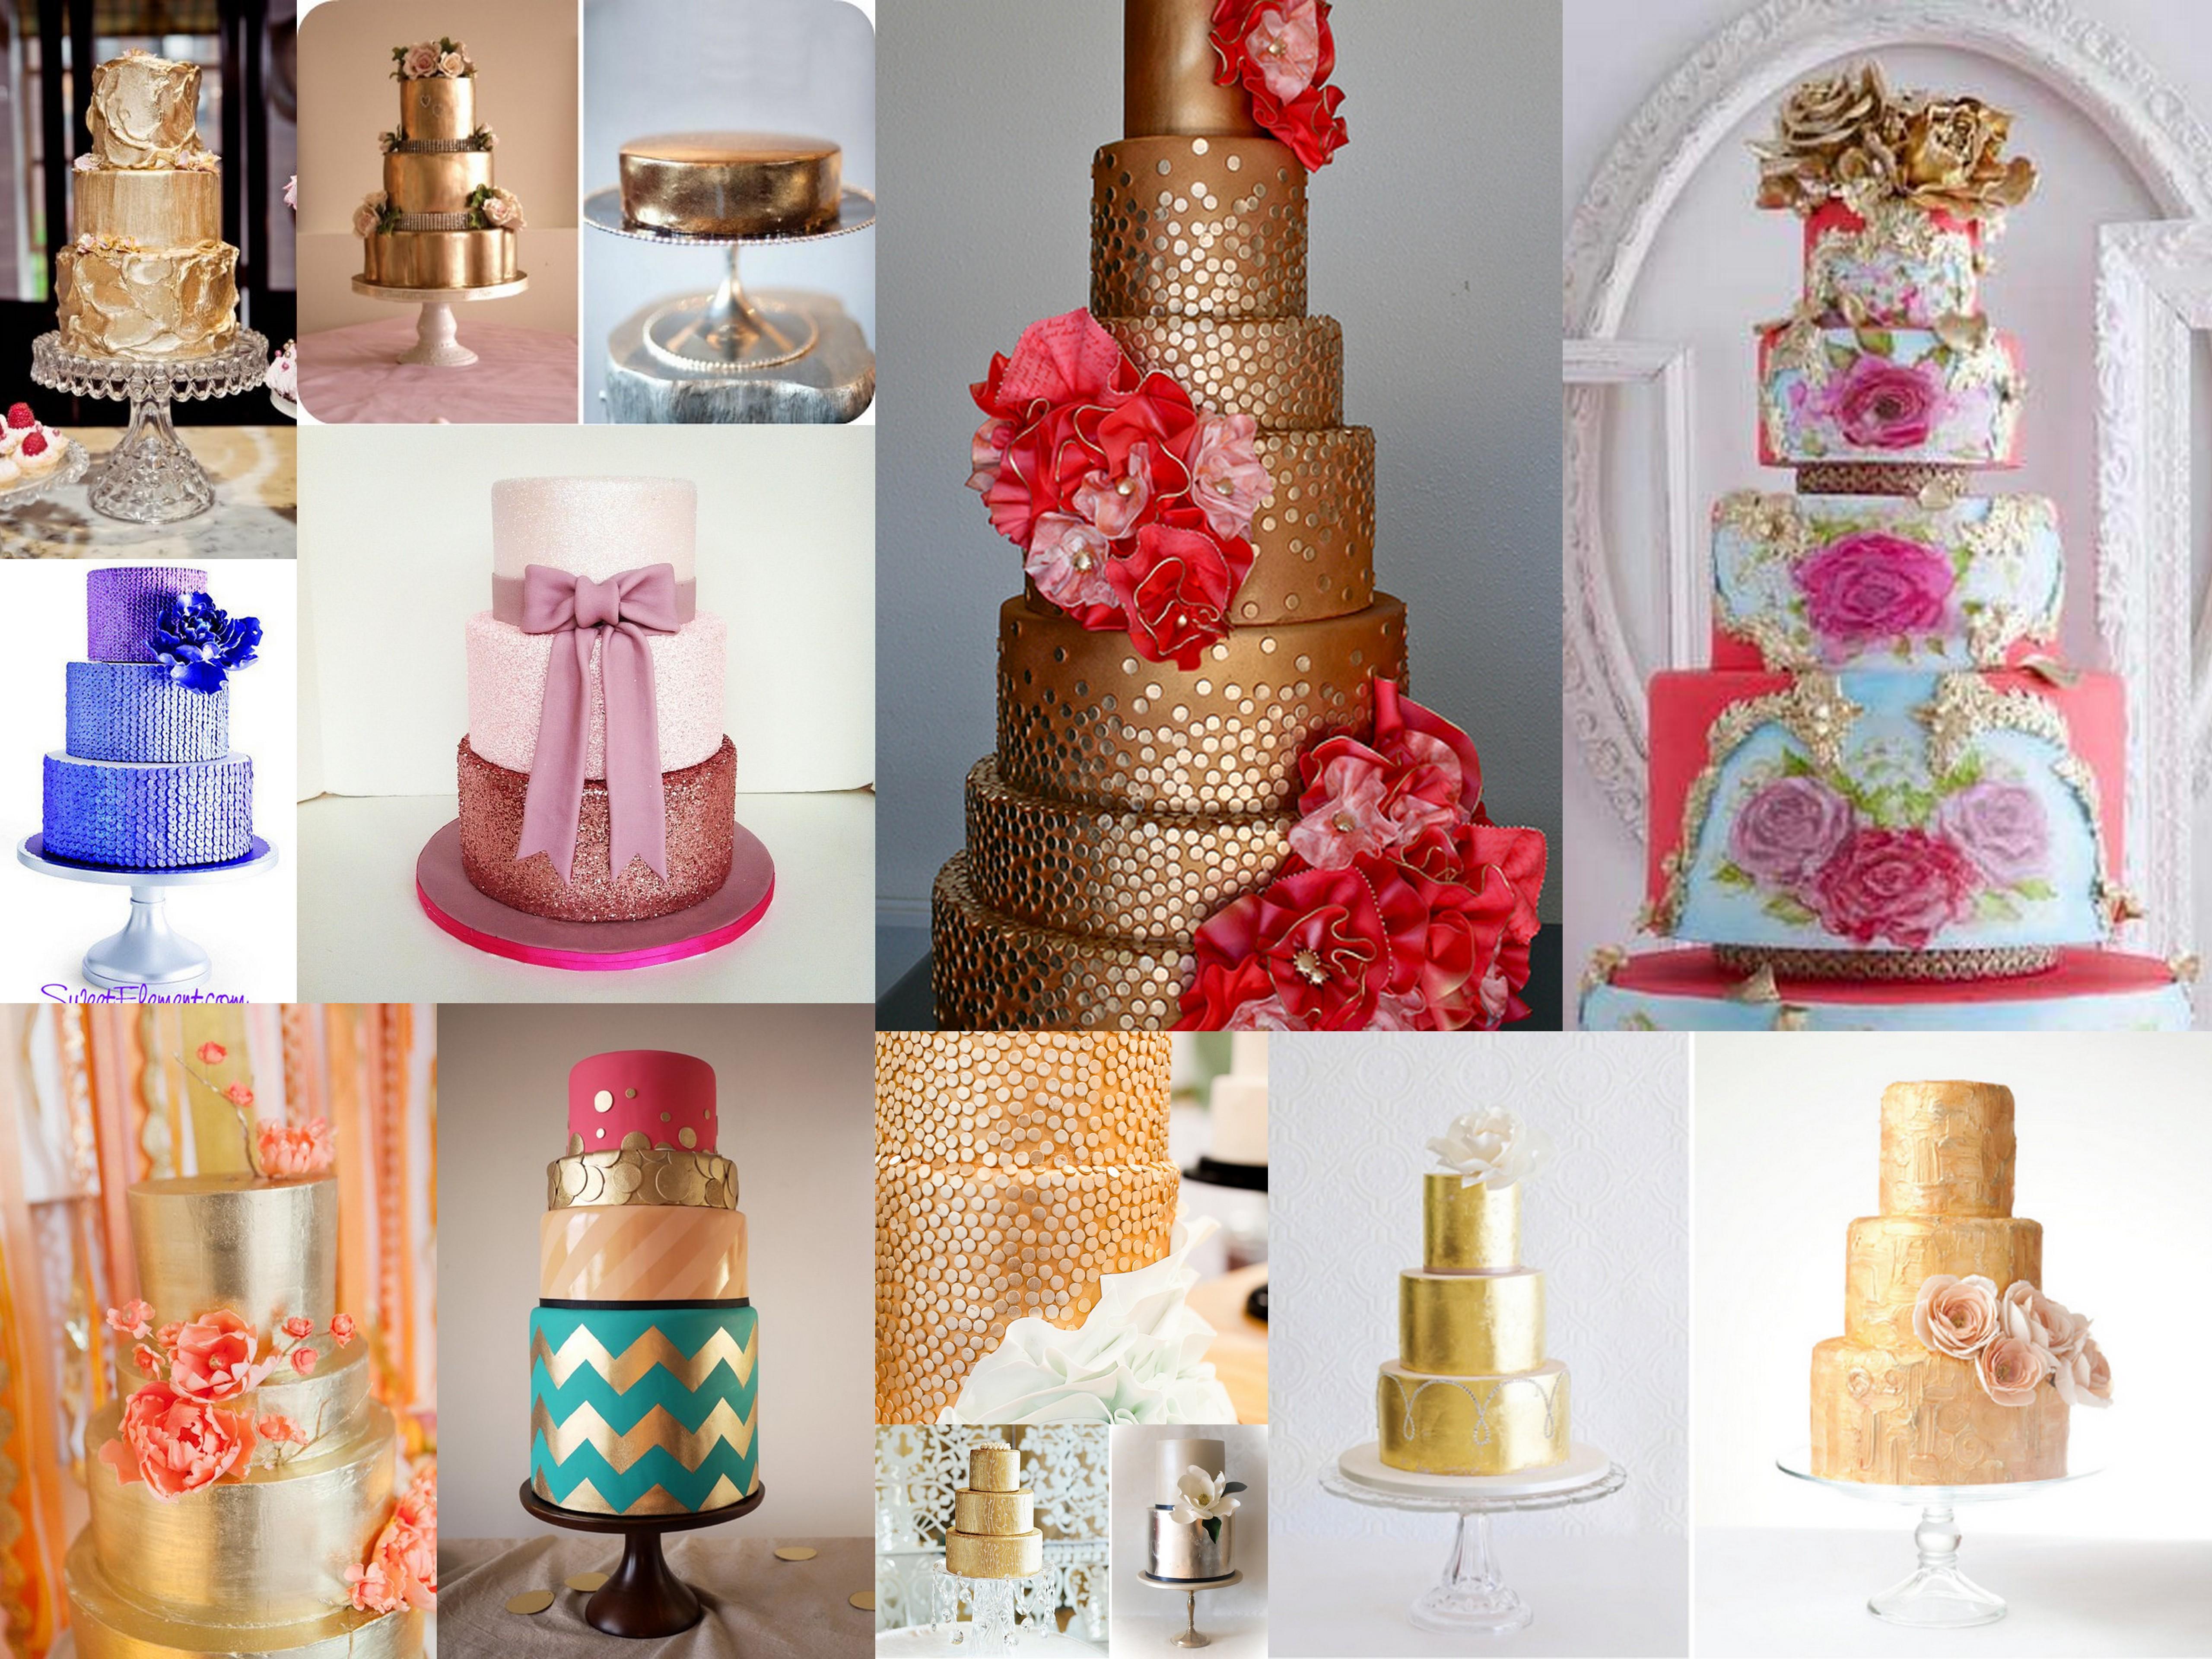 Glitter gilded amp glamorous fantastical wedding stylings